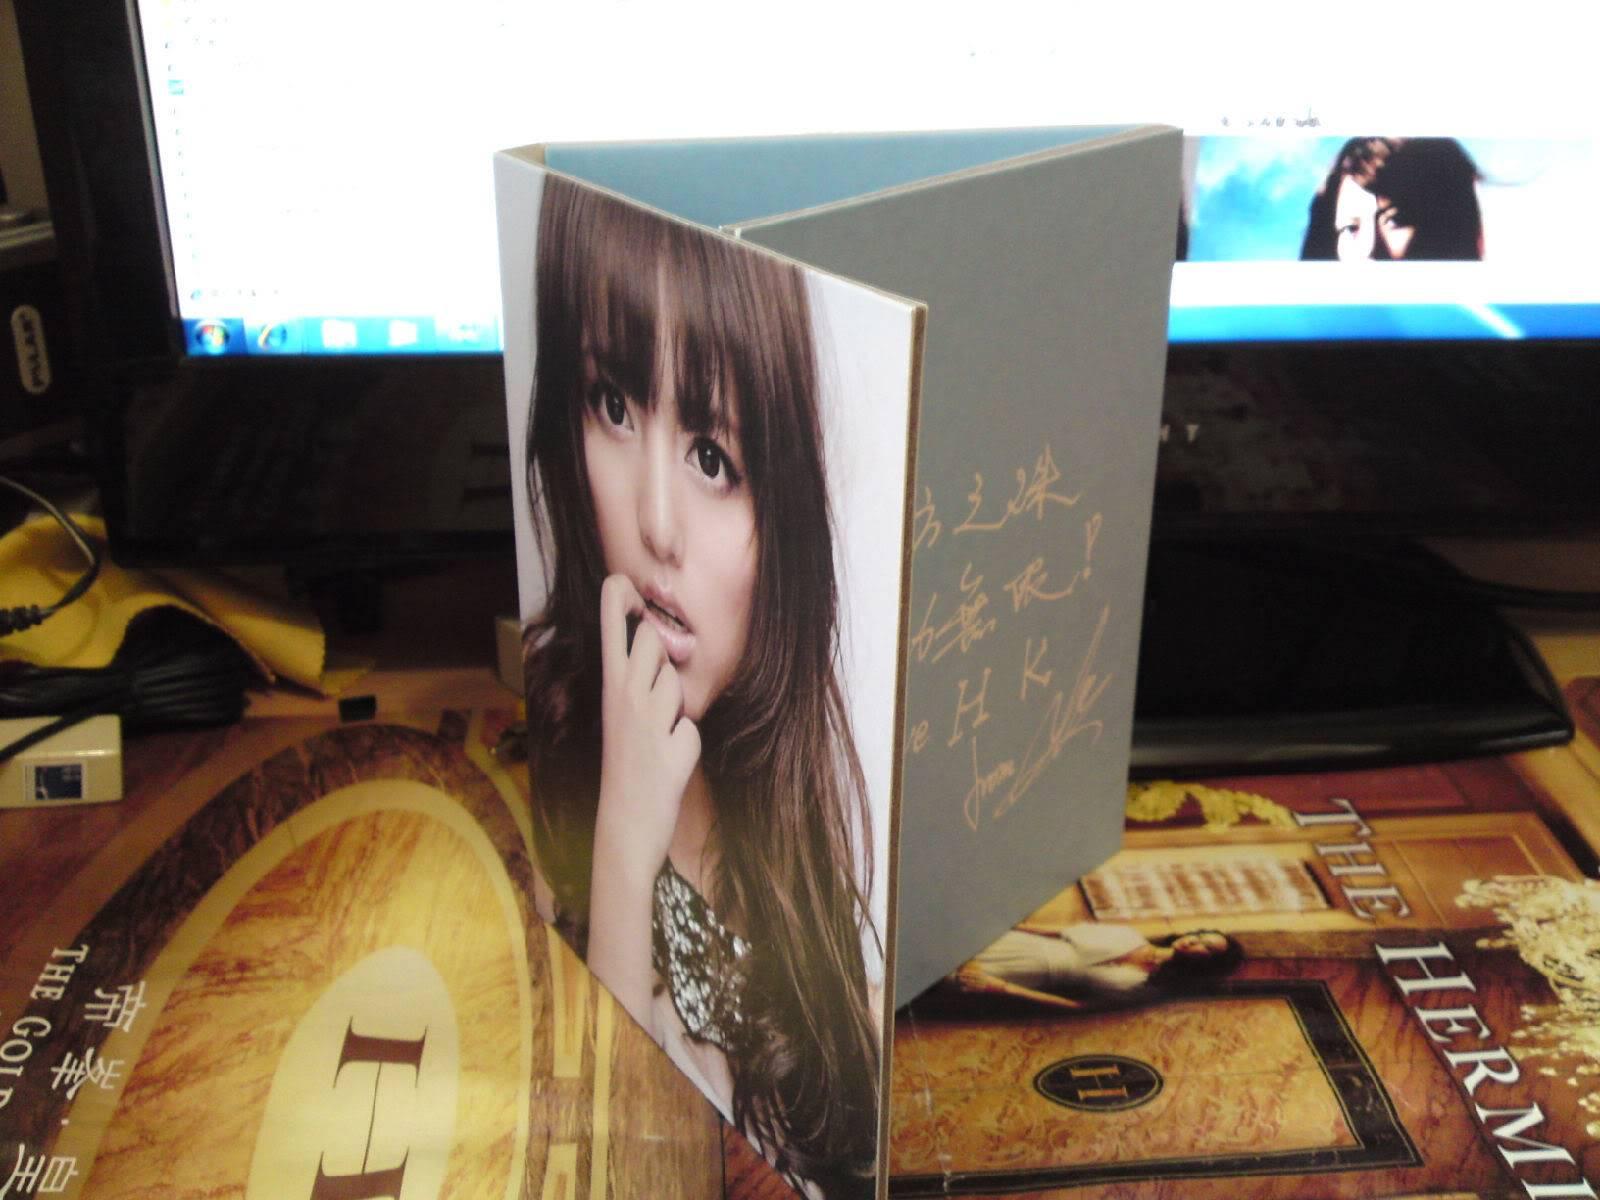 [Official] New Mandarin EP: 蘭色~Love Moon Light~ - Page 8 052635fd86db3b735e600873